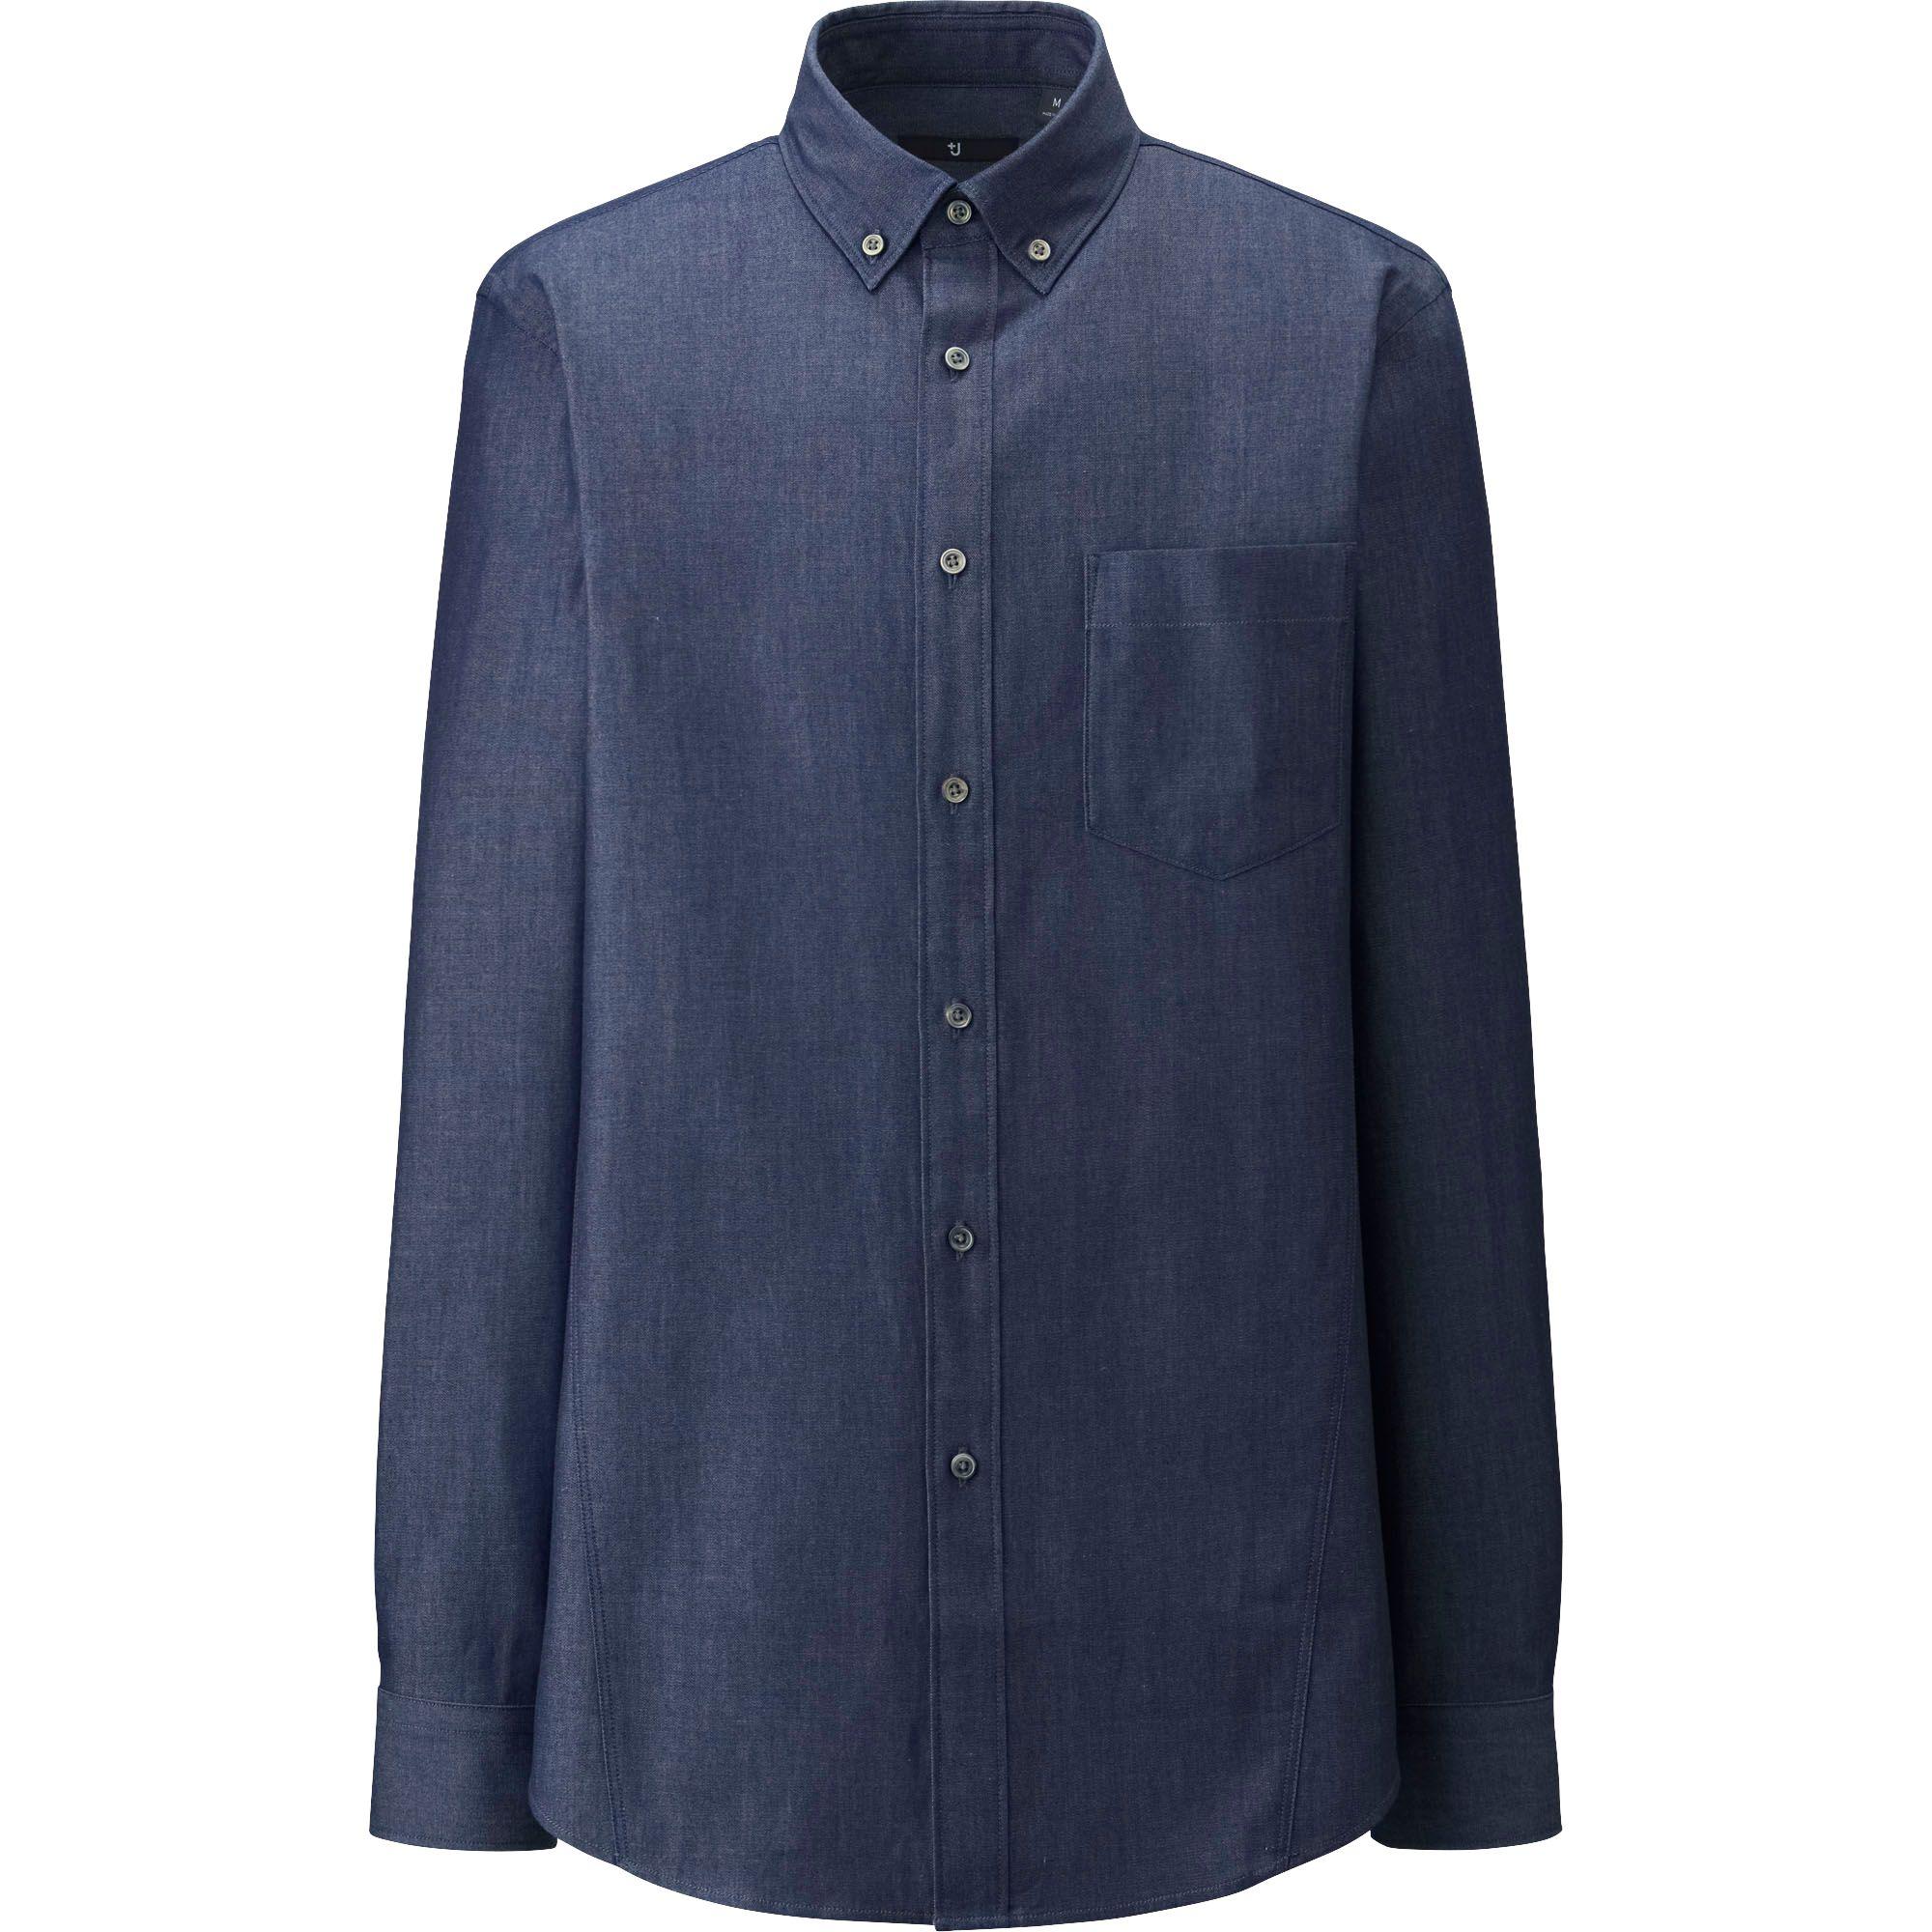 Uniqlo Men J Denim Slim Fit Long Sleeve Shirt In Blue